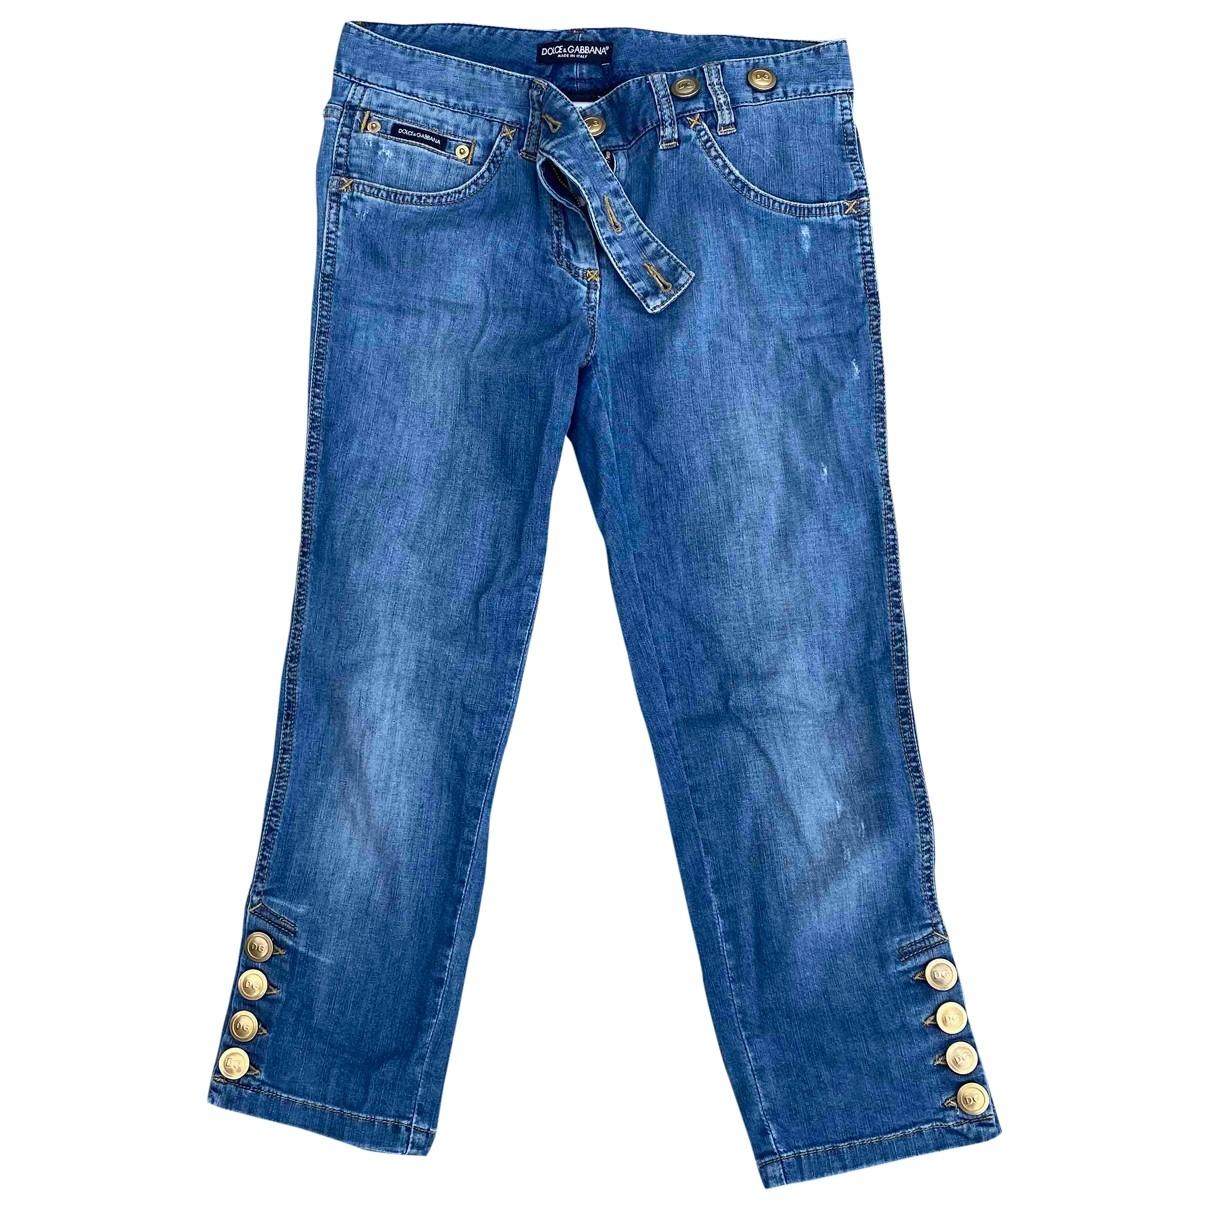 Dolce & Gabbana \N Blue Cotton - elasthane Jeans for Women 36 FR